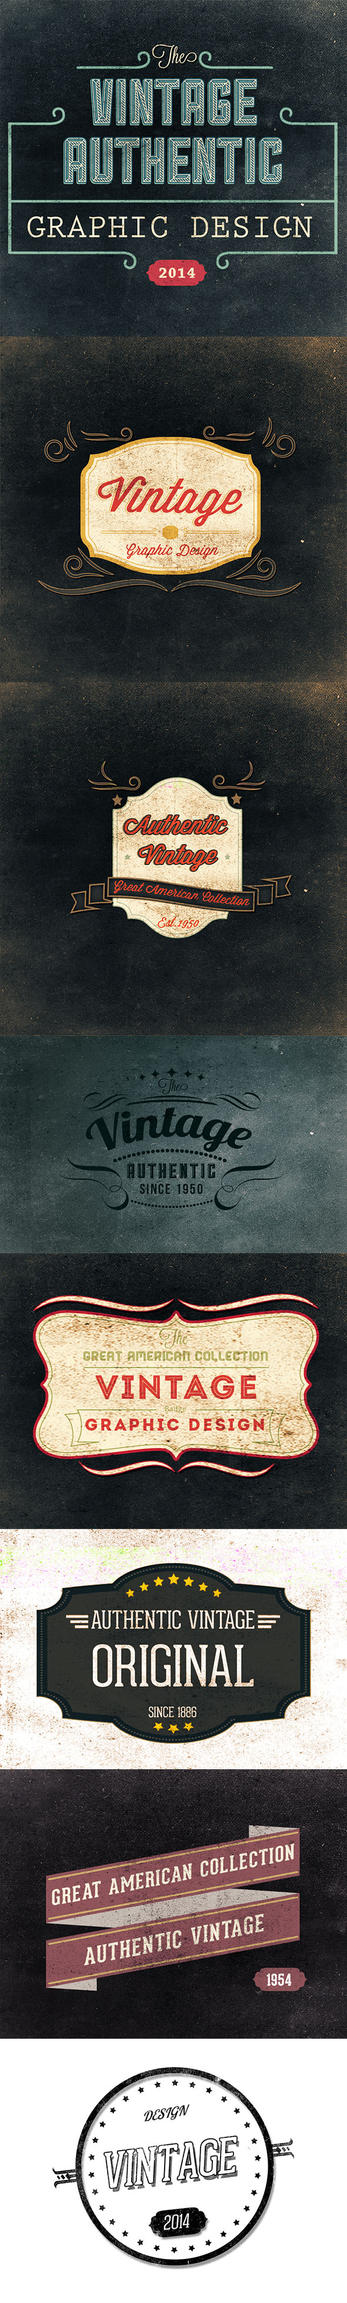 8 retro logo Vintage Dowmload link PSD by kadayoub